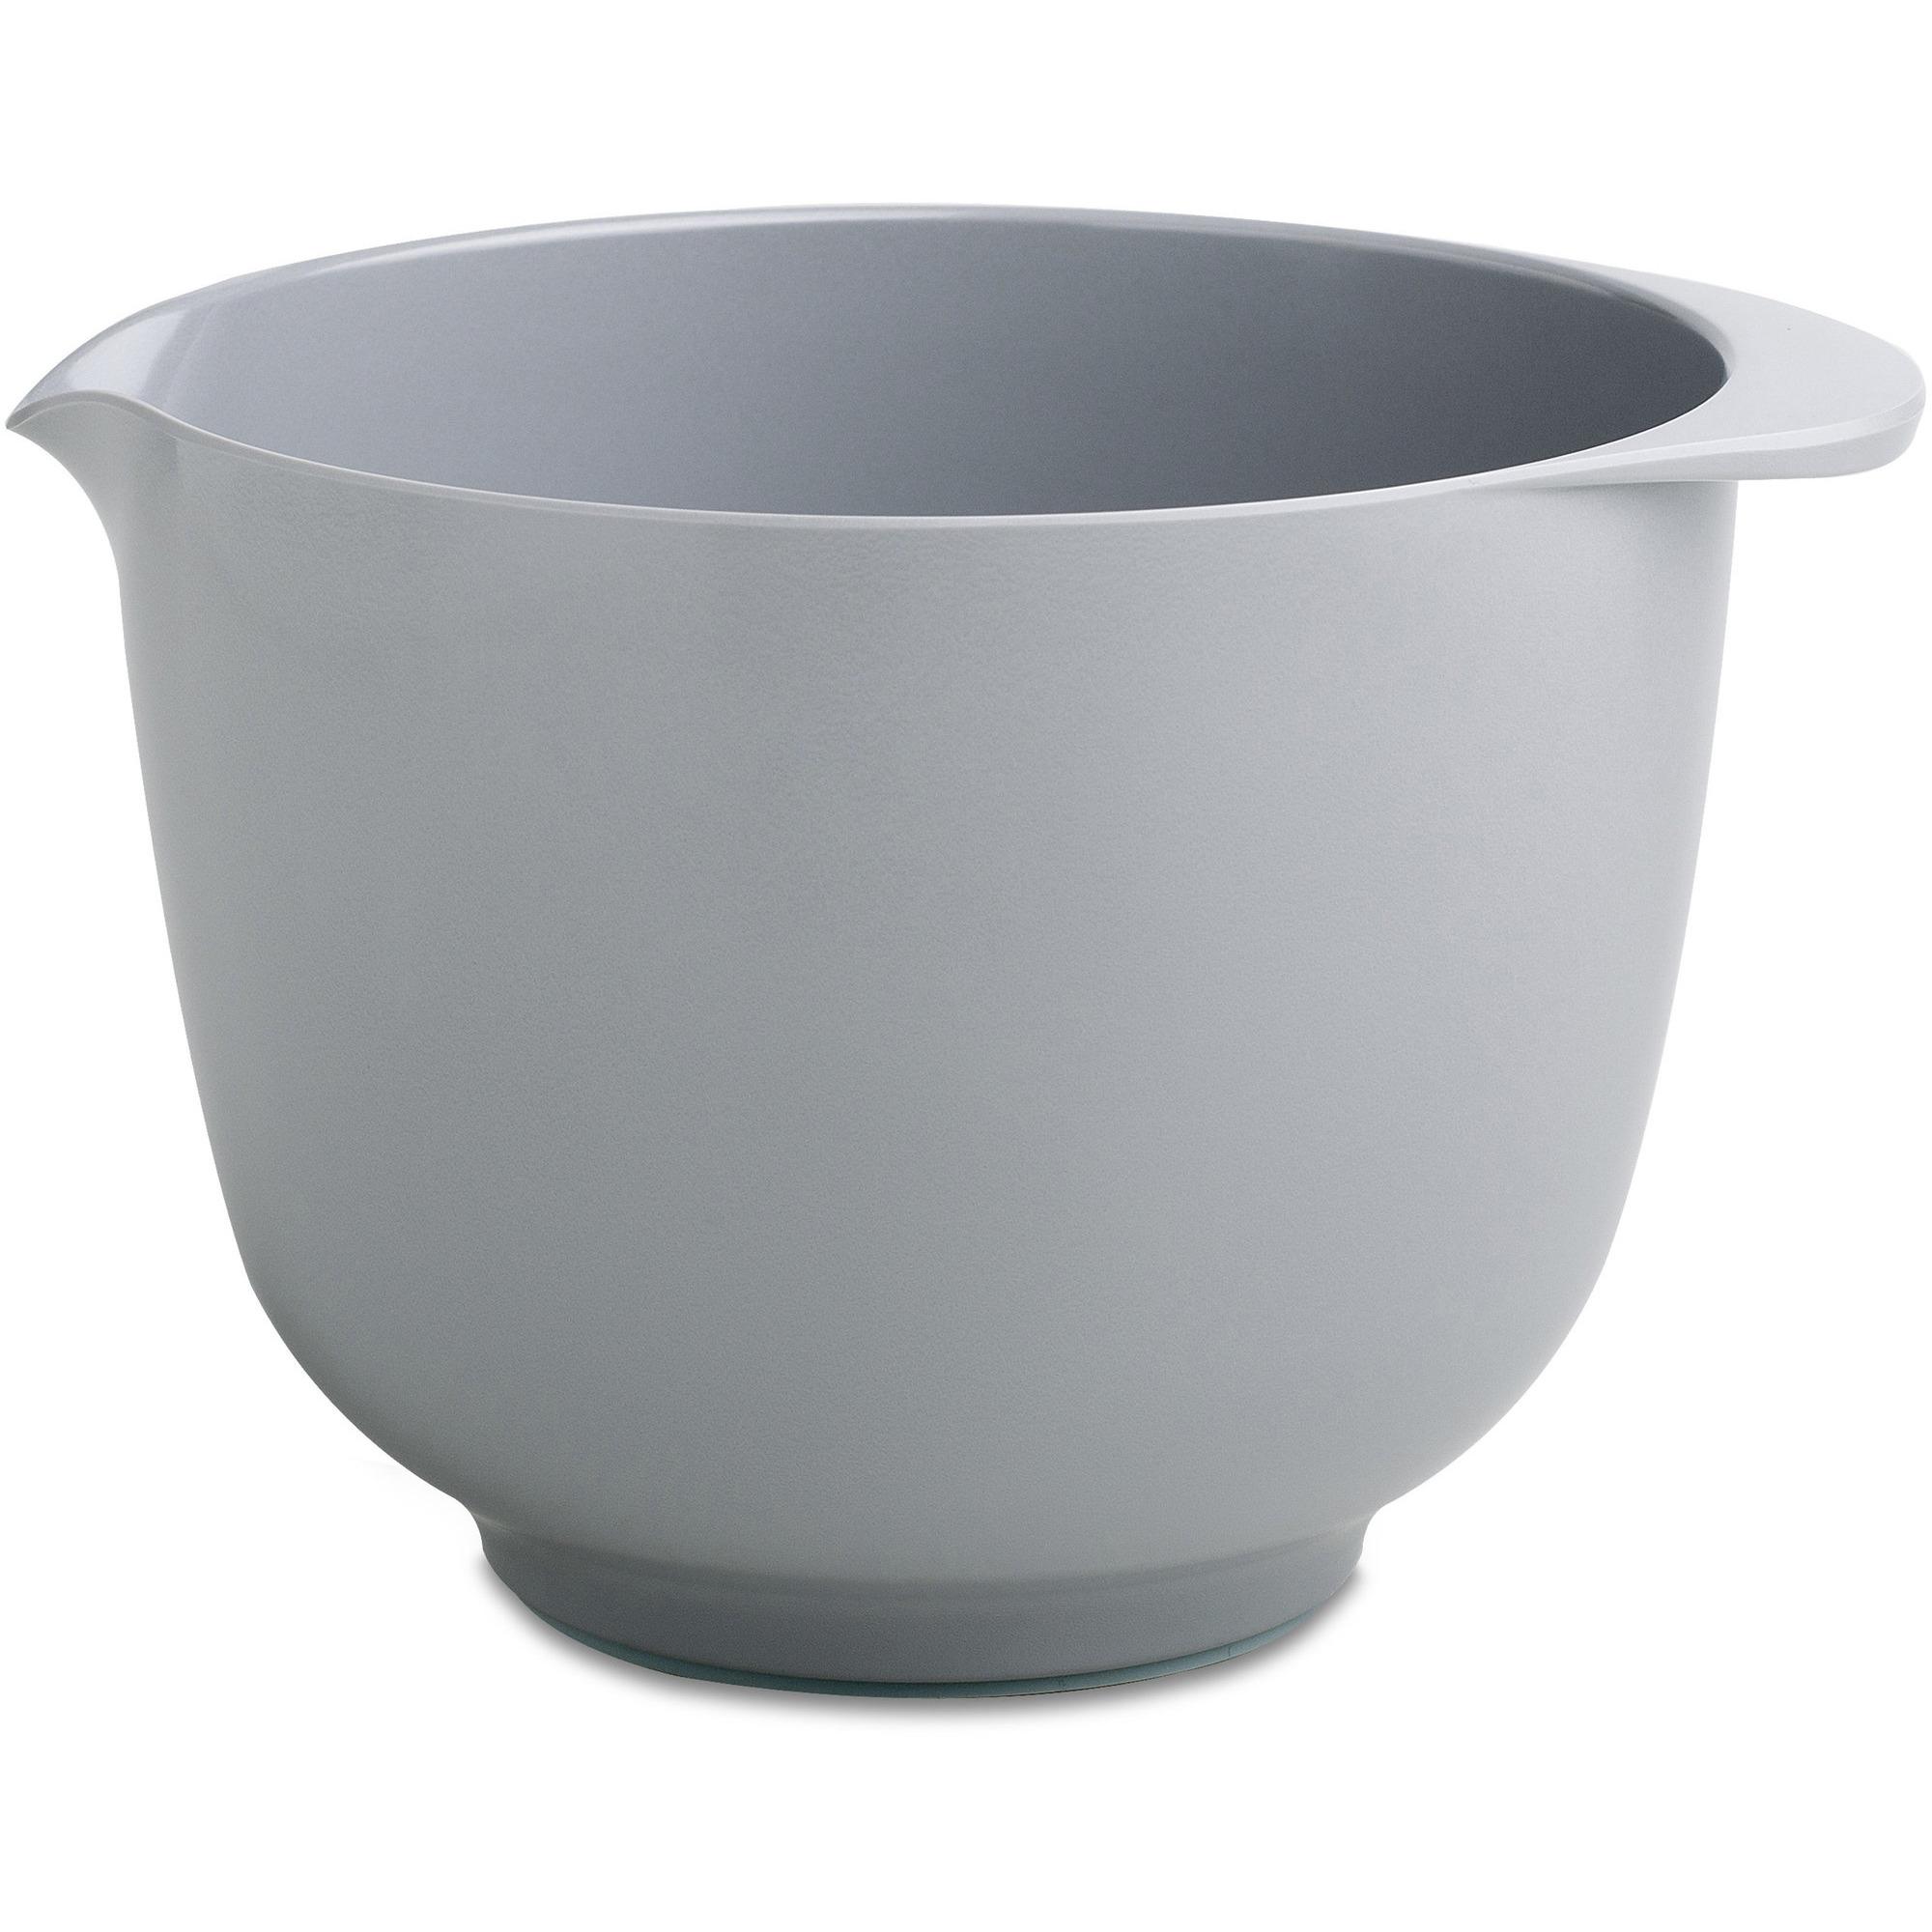 Rosti Mepal Skål Grå 15 liter